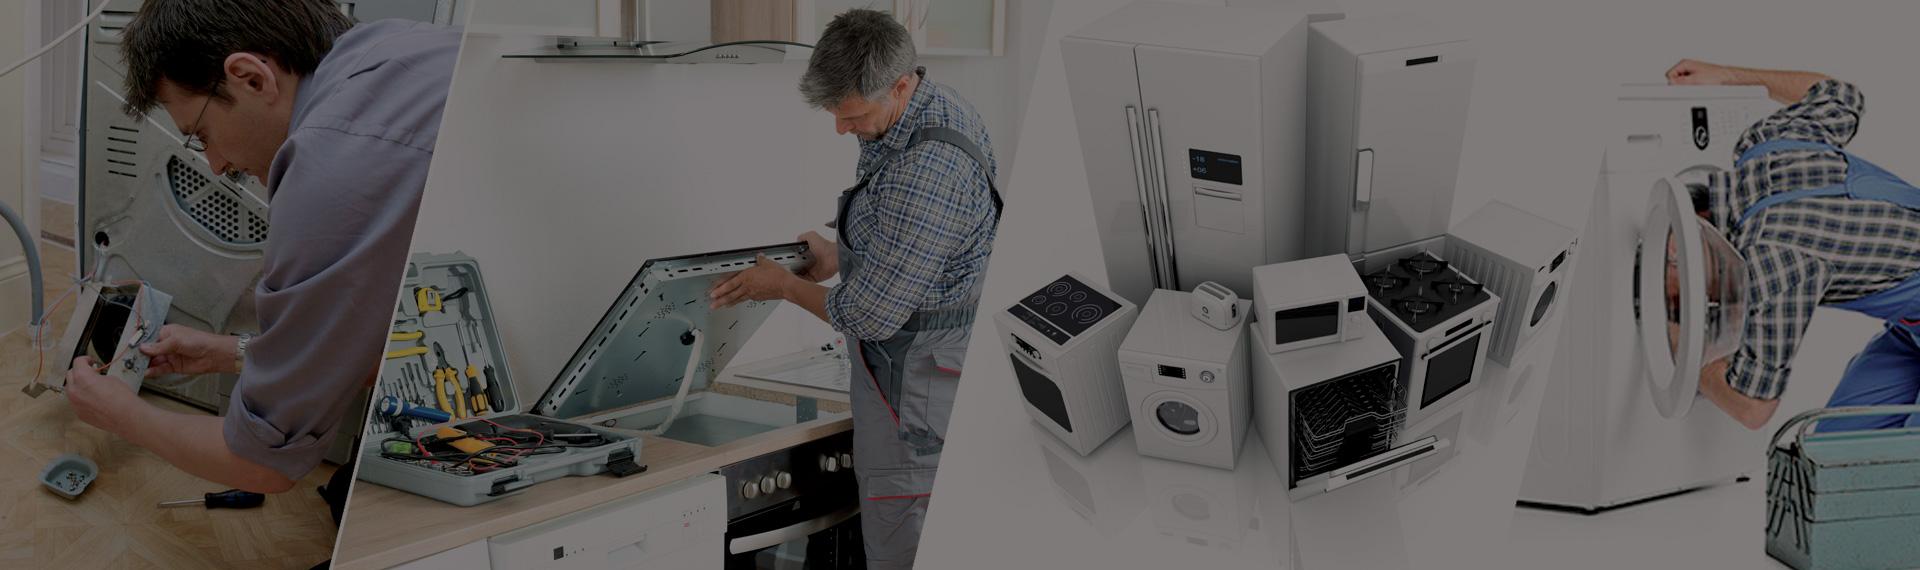 Teckrom Appliance Repair San Diego CA